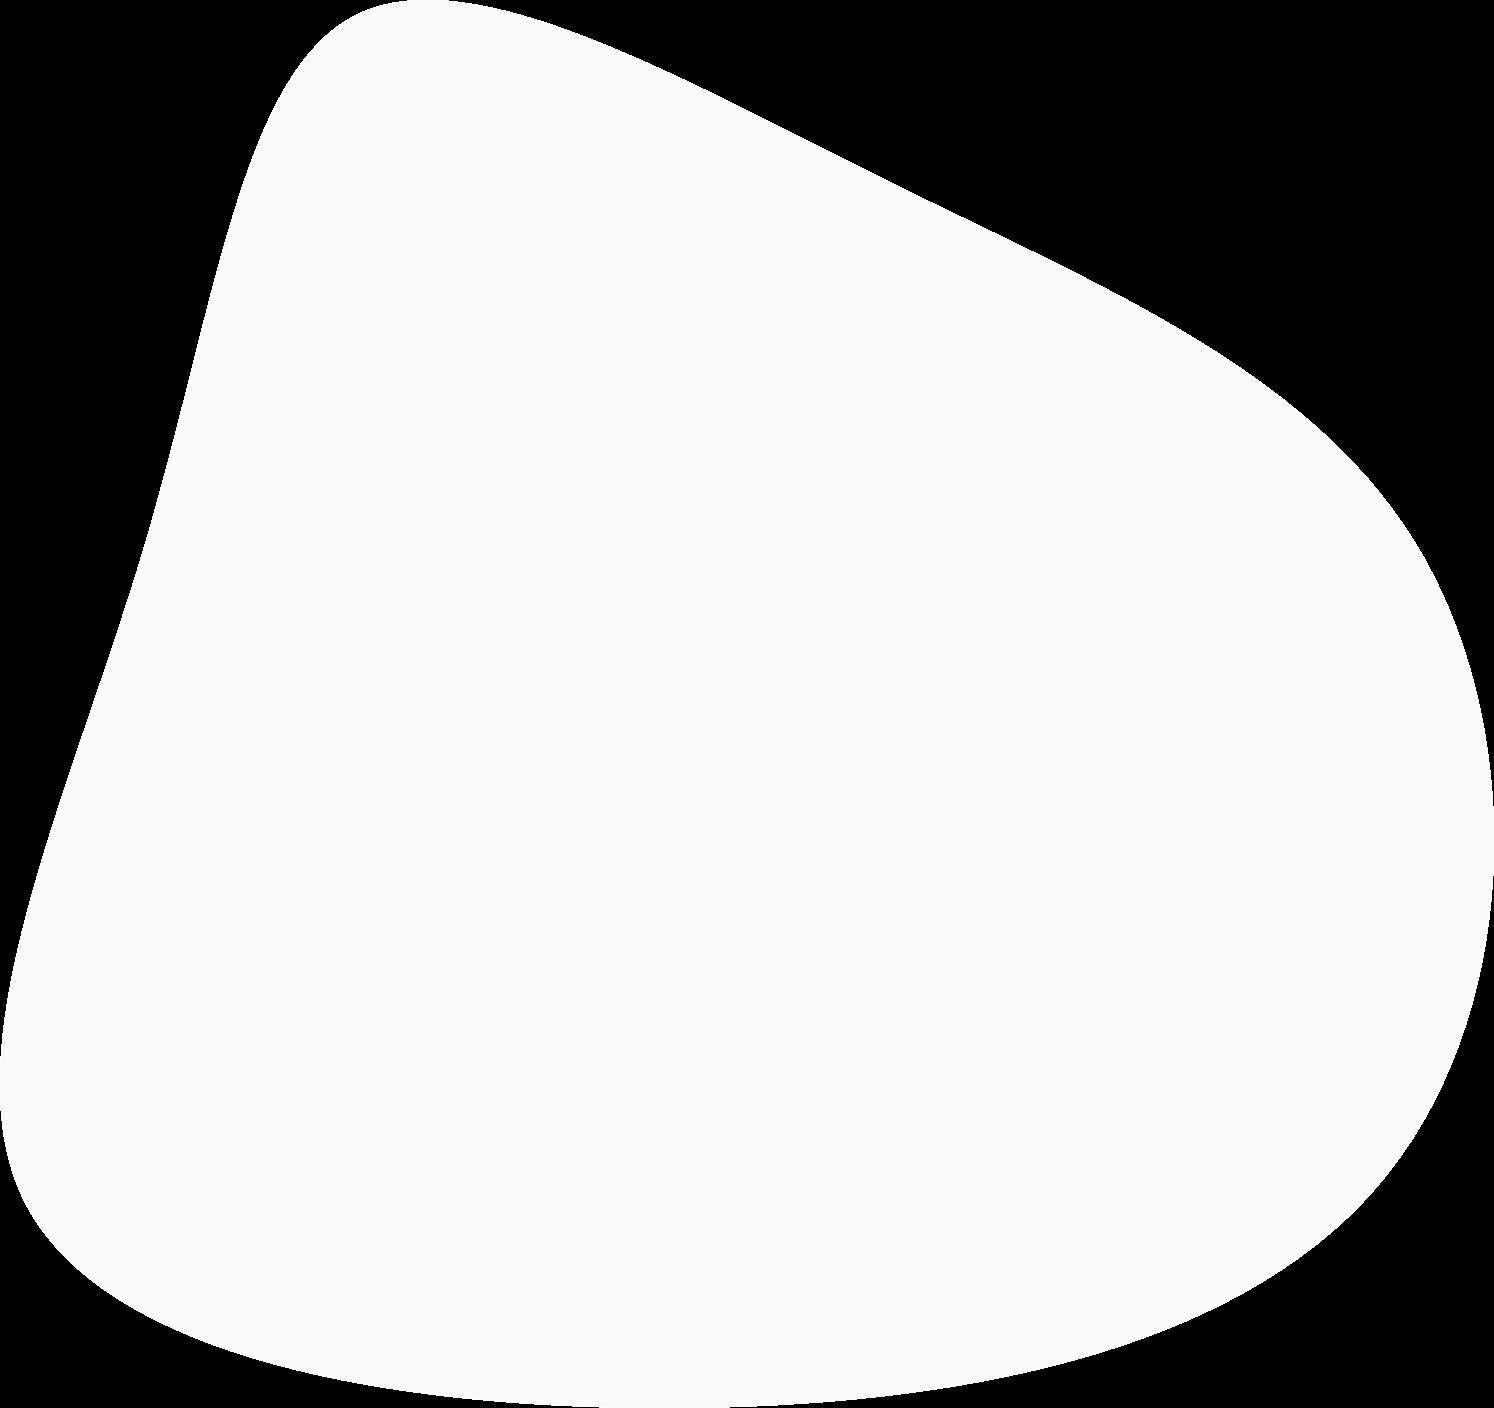 Illustration full morph grey